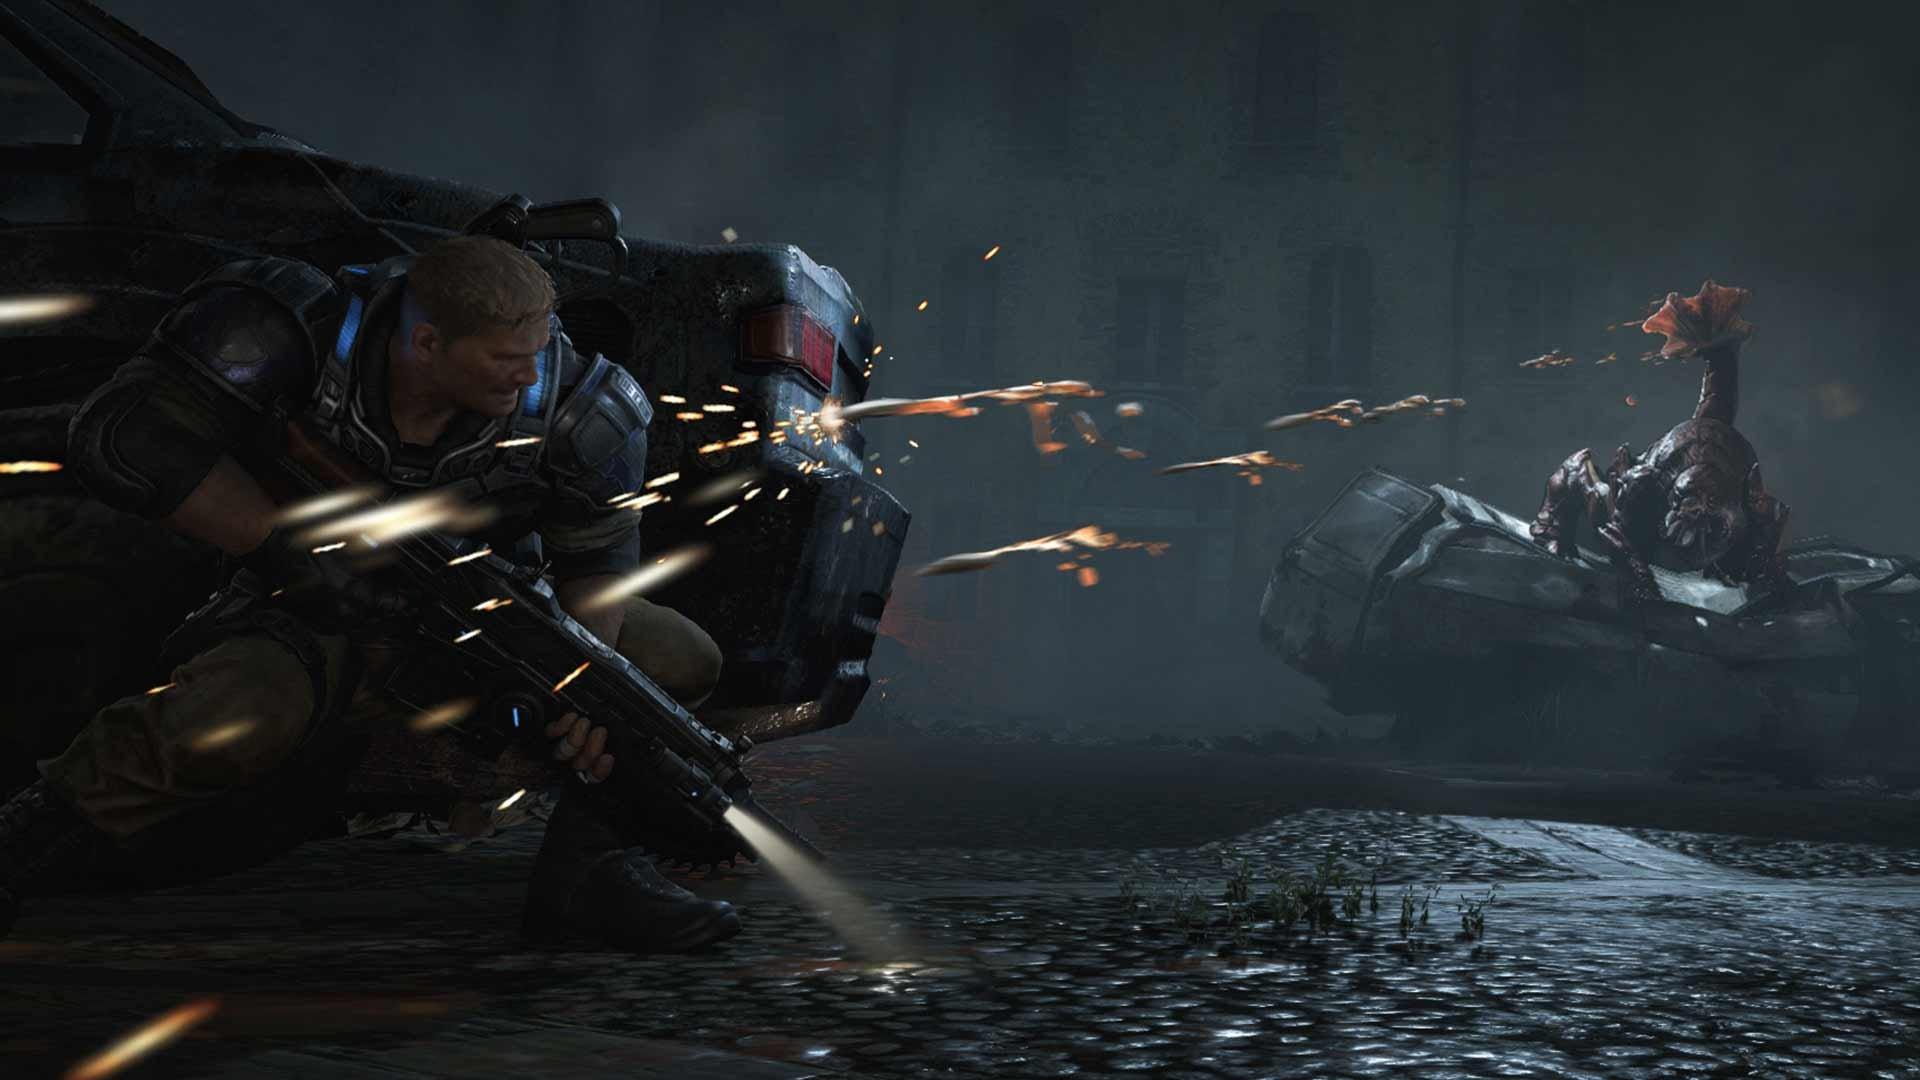 E3 2018: Gears Of War 5 Is Official